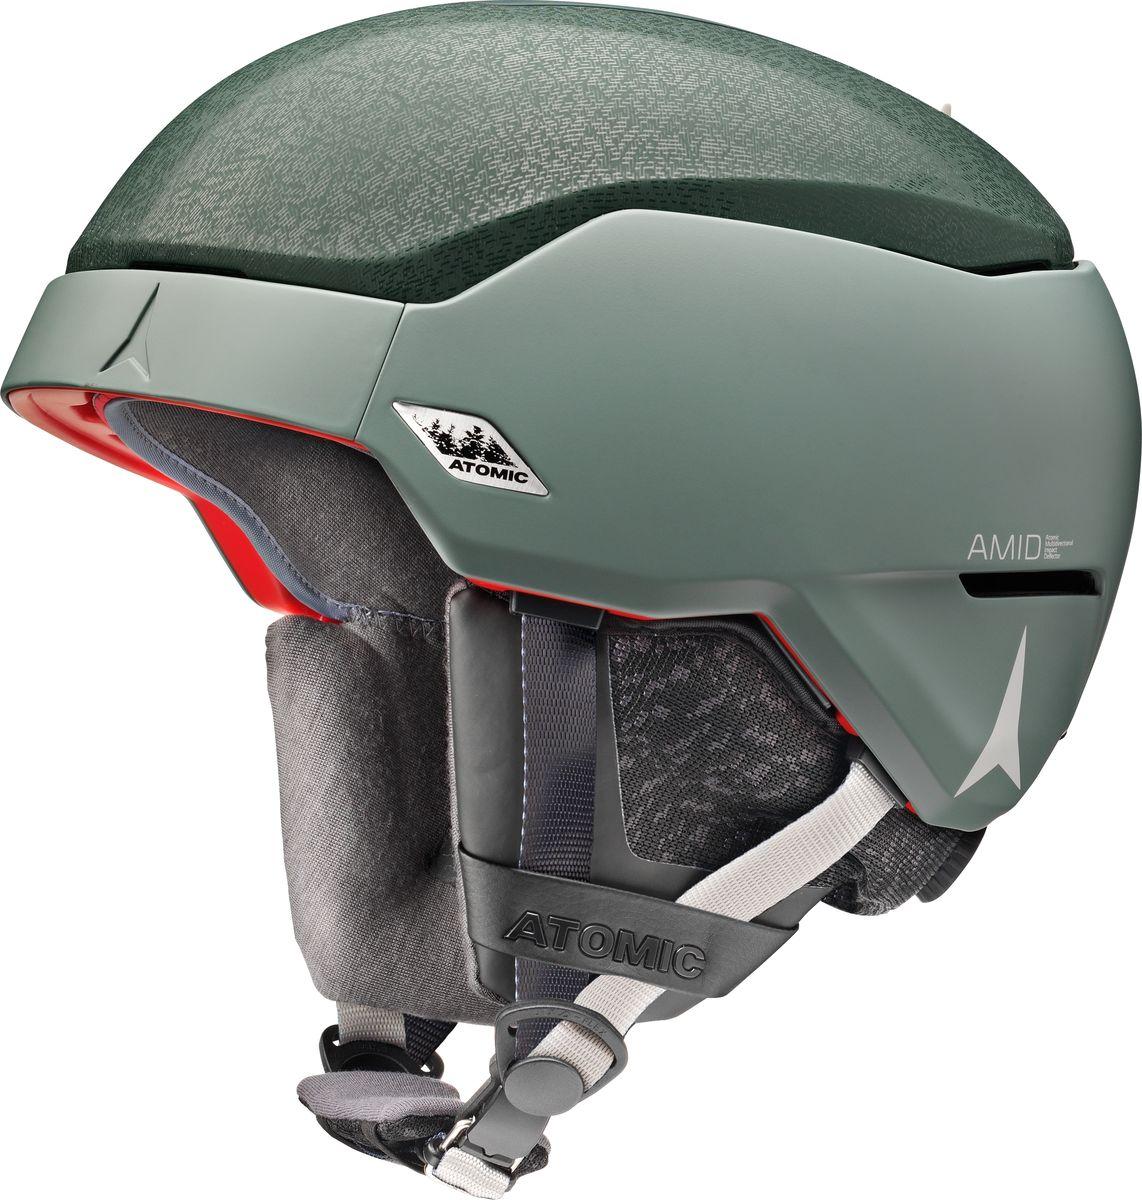 Шлем горнолыжный Atomic Count Amid, цвет: зеленый. Размер M (56-59)